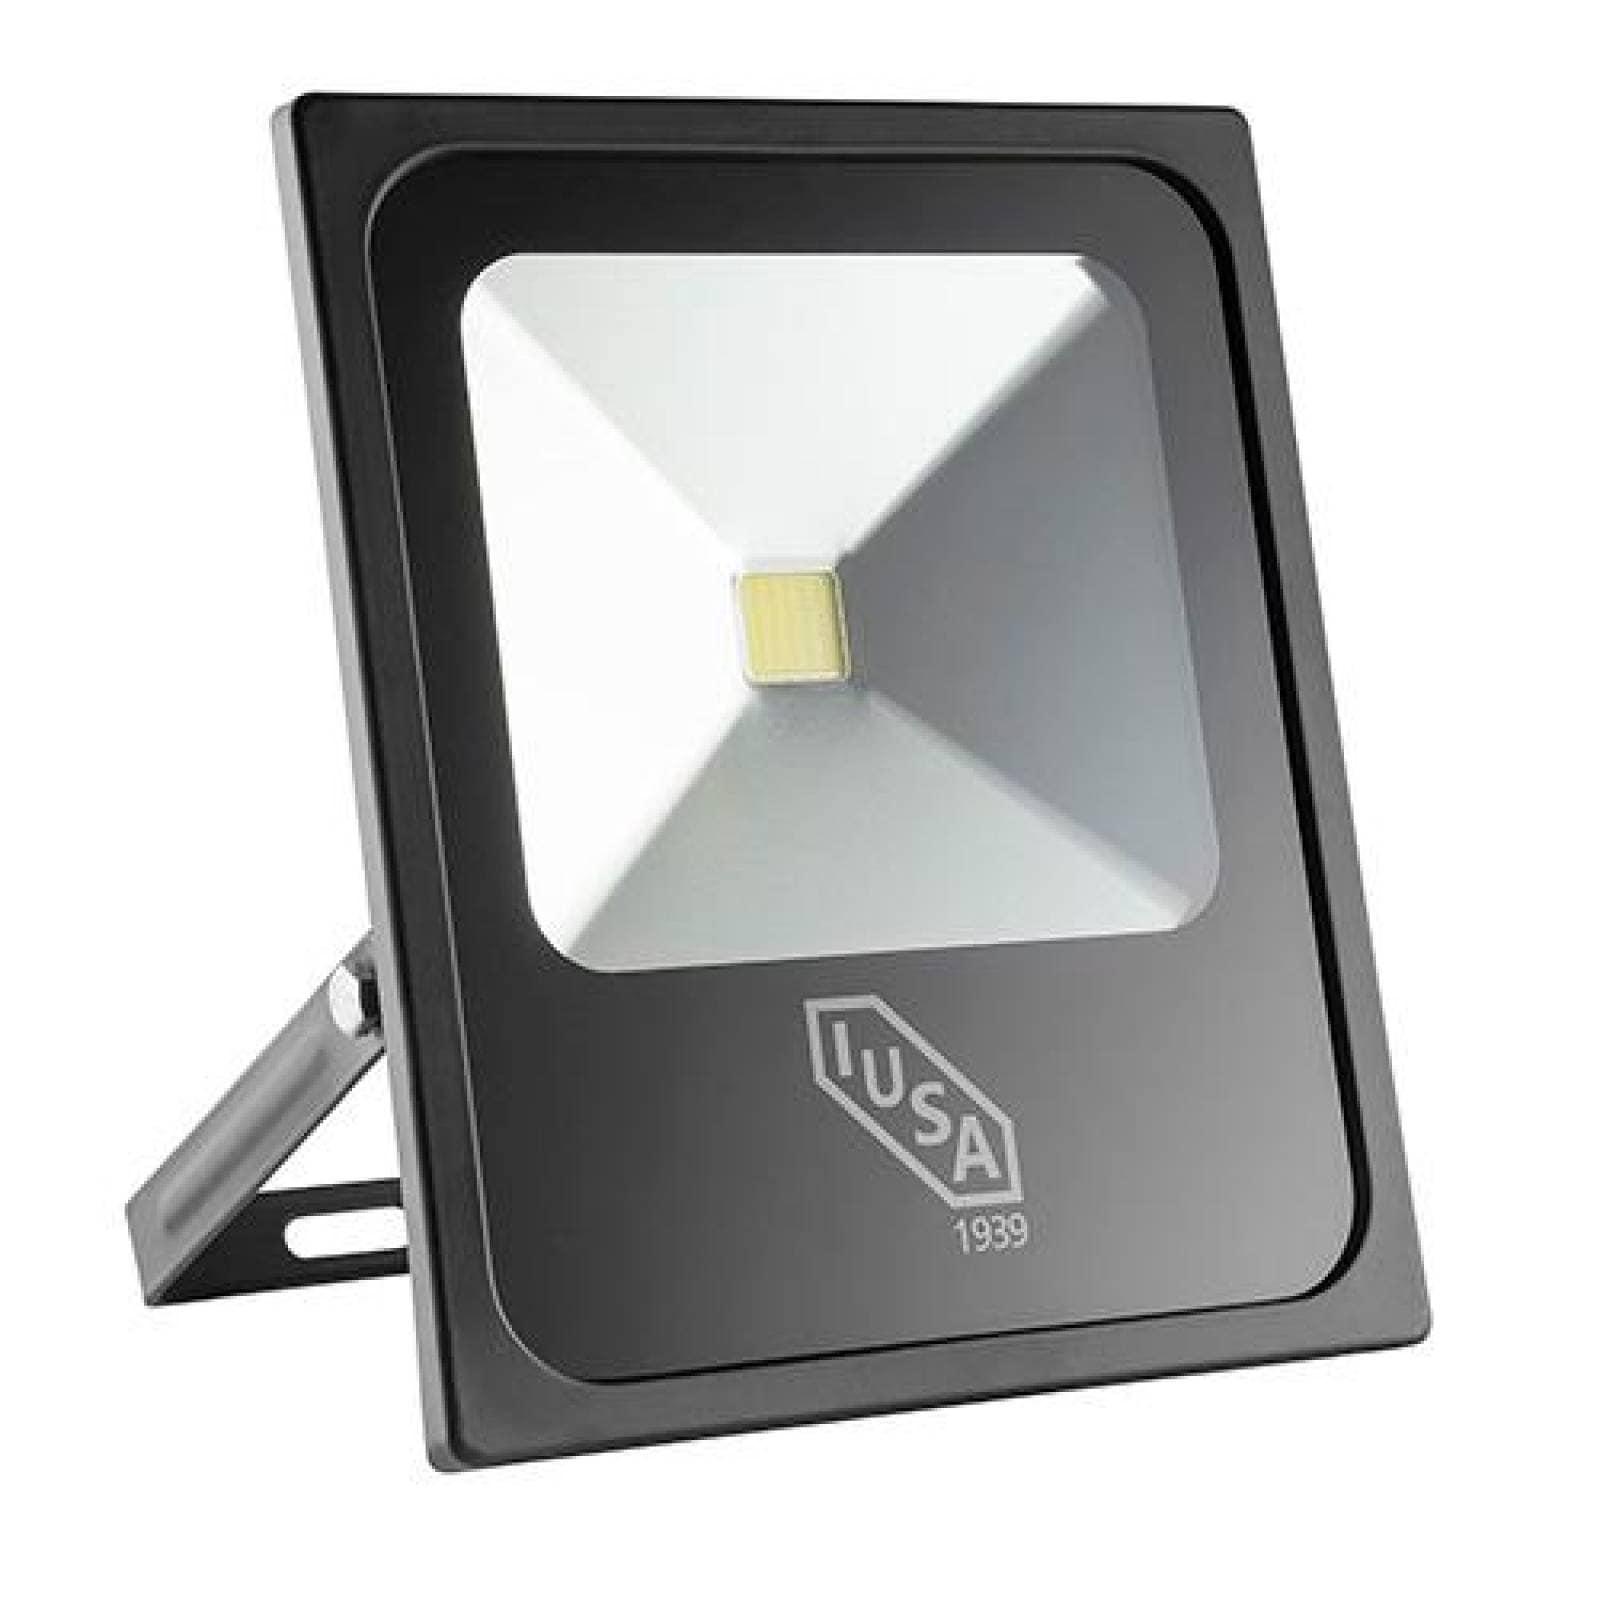 Reflector exterior slim LED 10 W 65 K